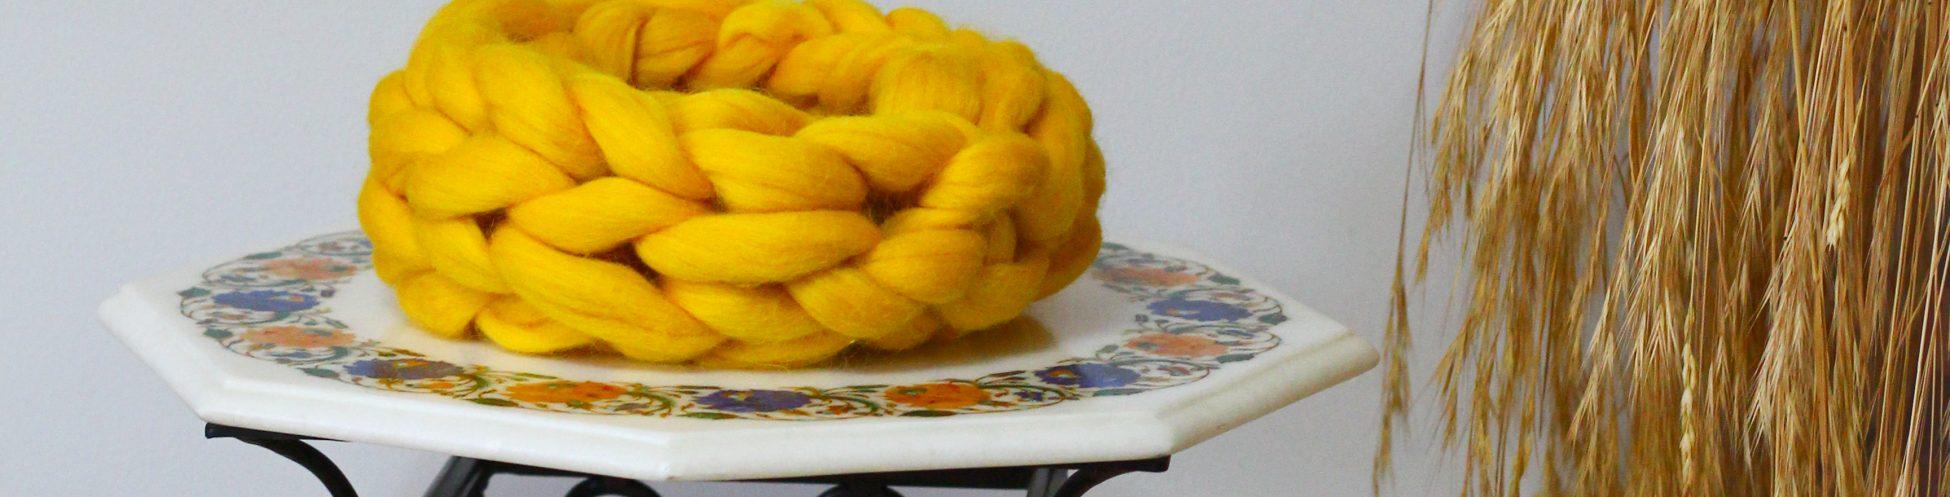 lana merinos, merinocraft, fular circular